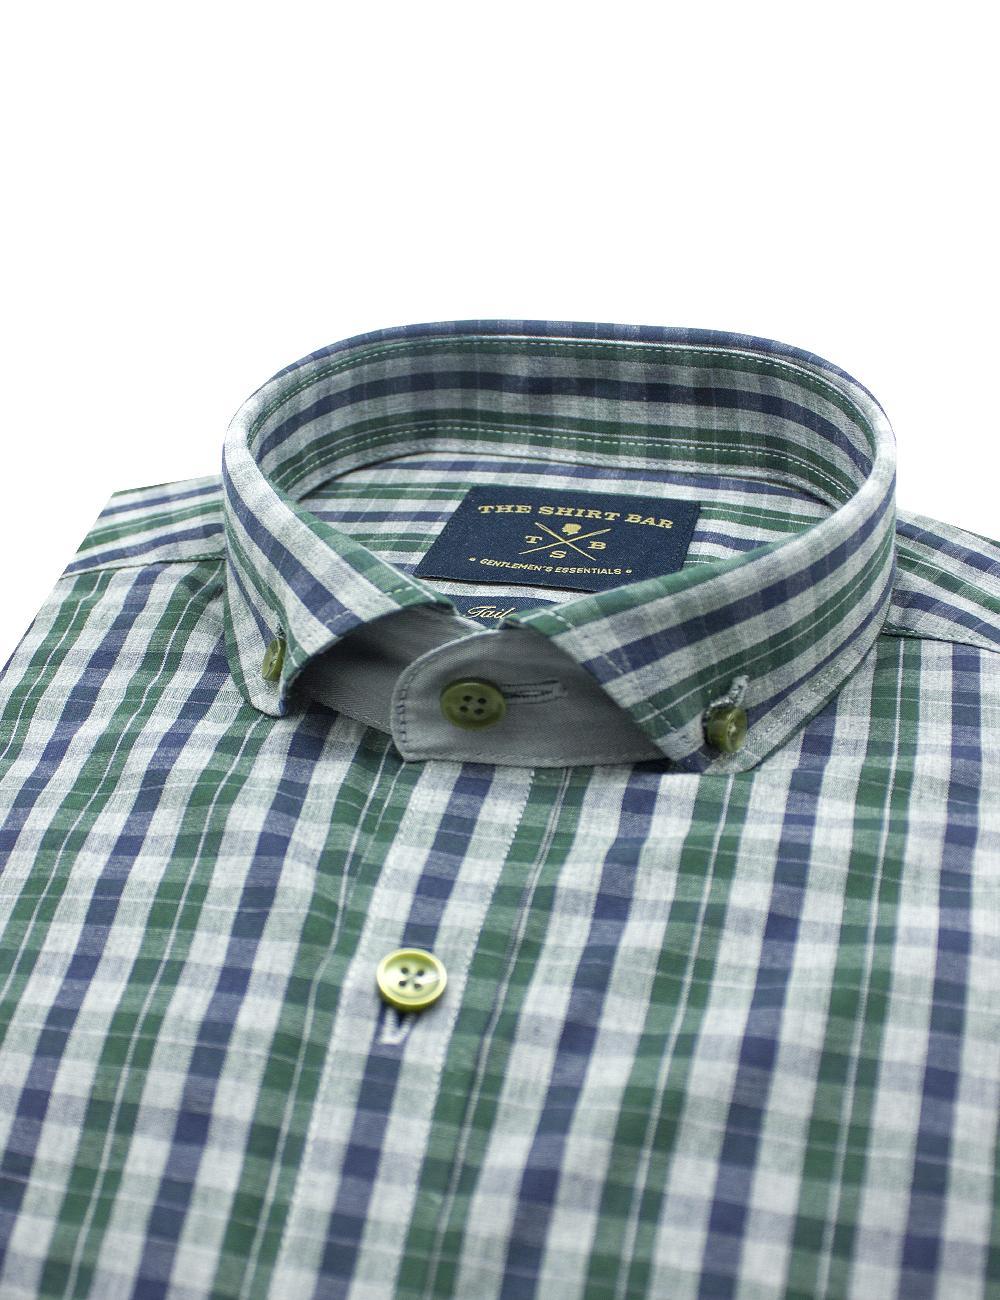 Green/ Navy/ Grey Checks Button Down Collar Slim / Tailored Fit Long Sleeve Shirt - TF7E2.19